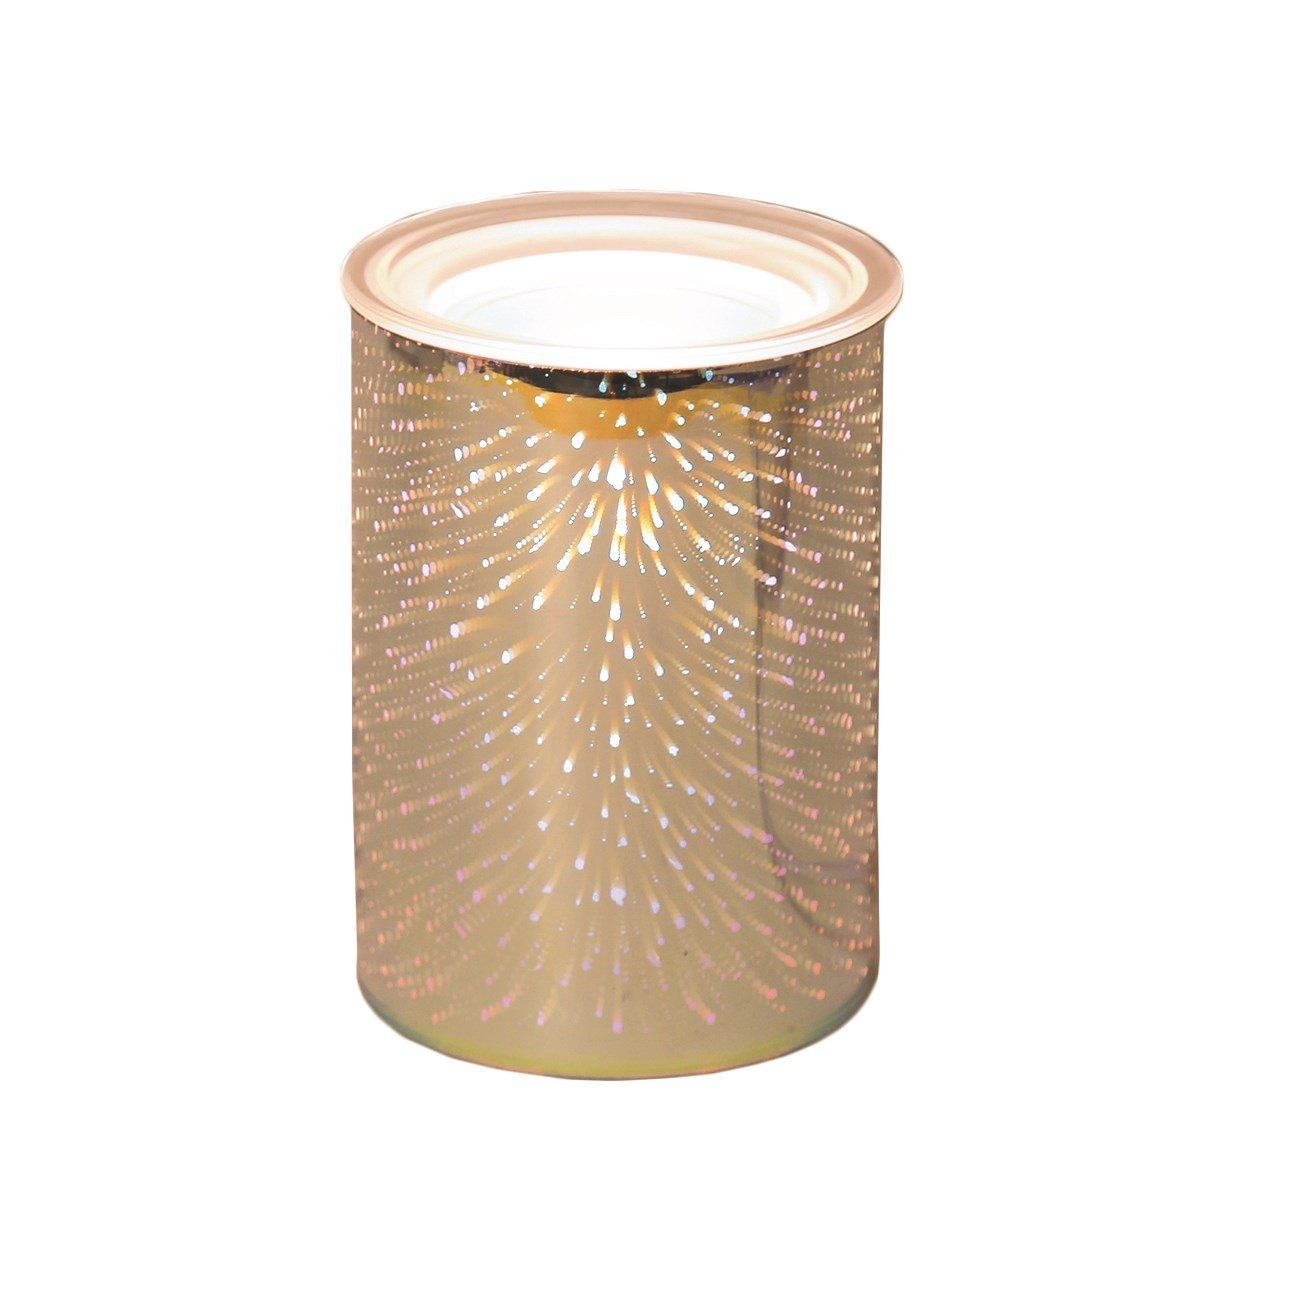 3D Star Field Design Electric Wax Melt Burner Lamp Scented Tart Fragrance Aroma Warmer 14cm Tooltime®